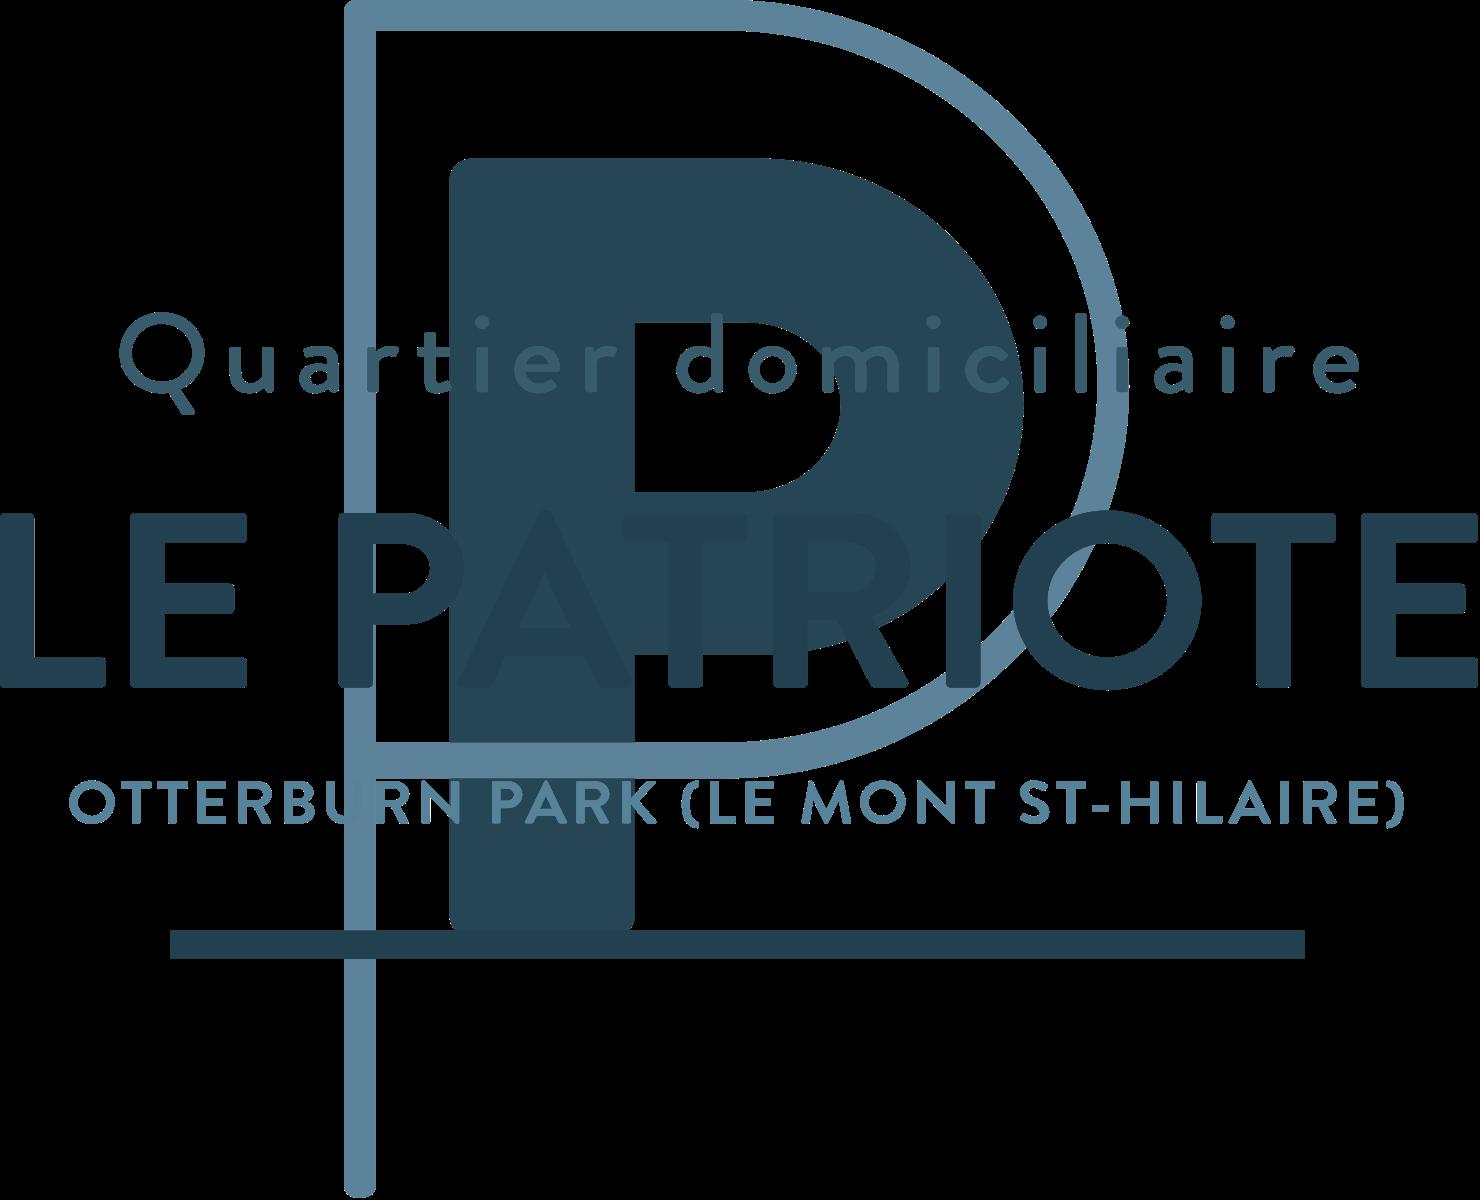 Quartier-domiciliaire-Le-Patriote